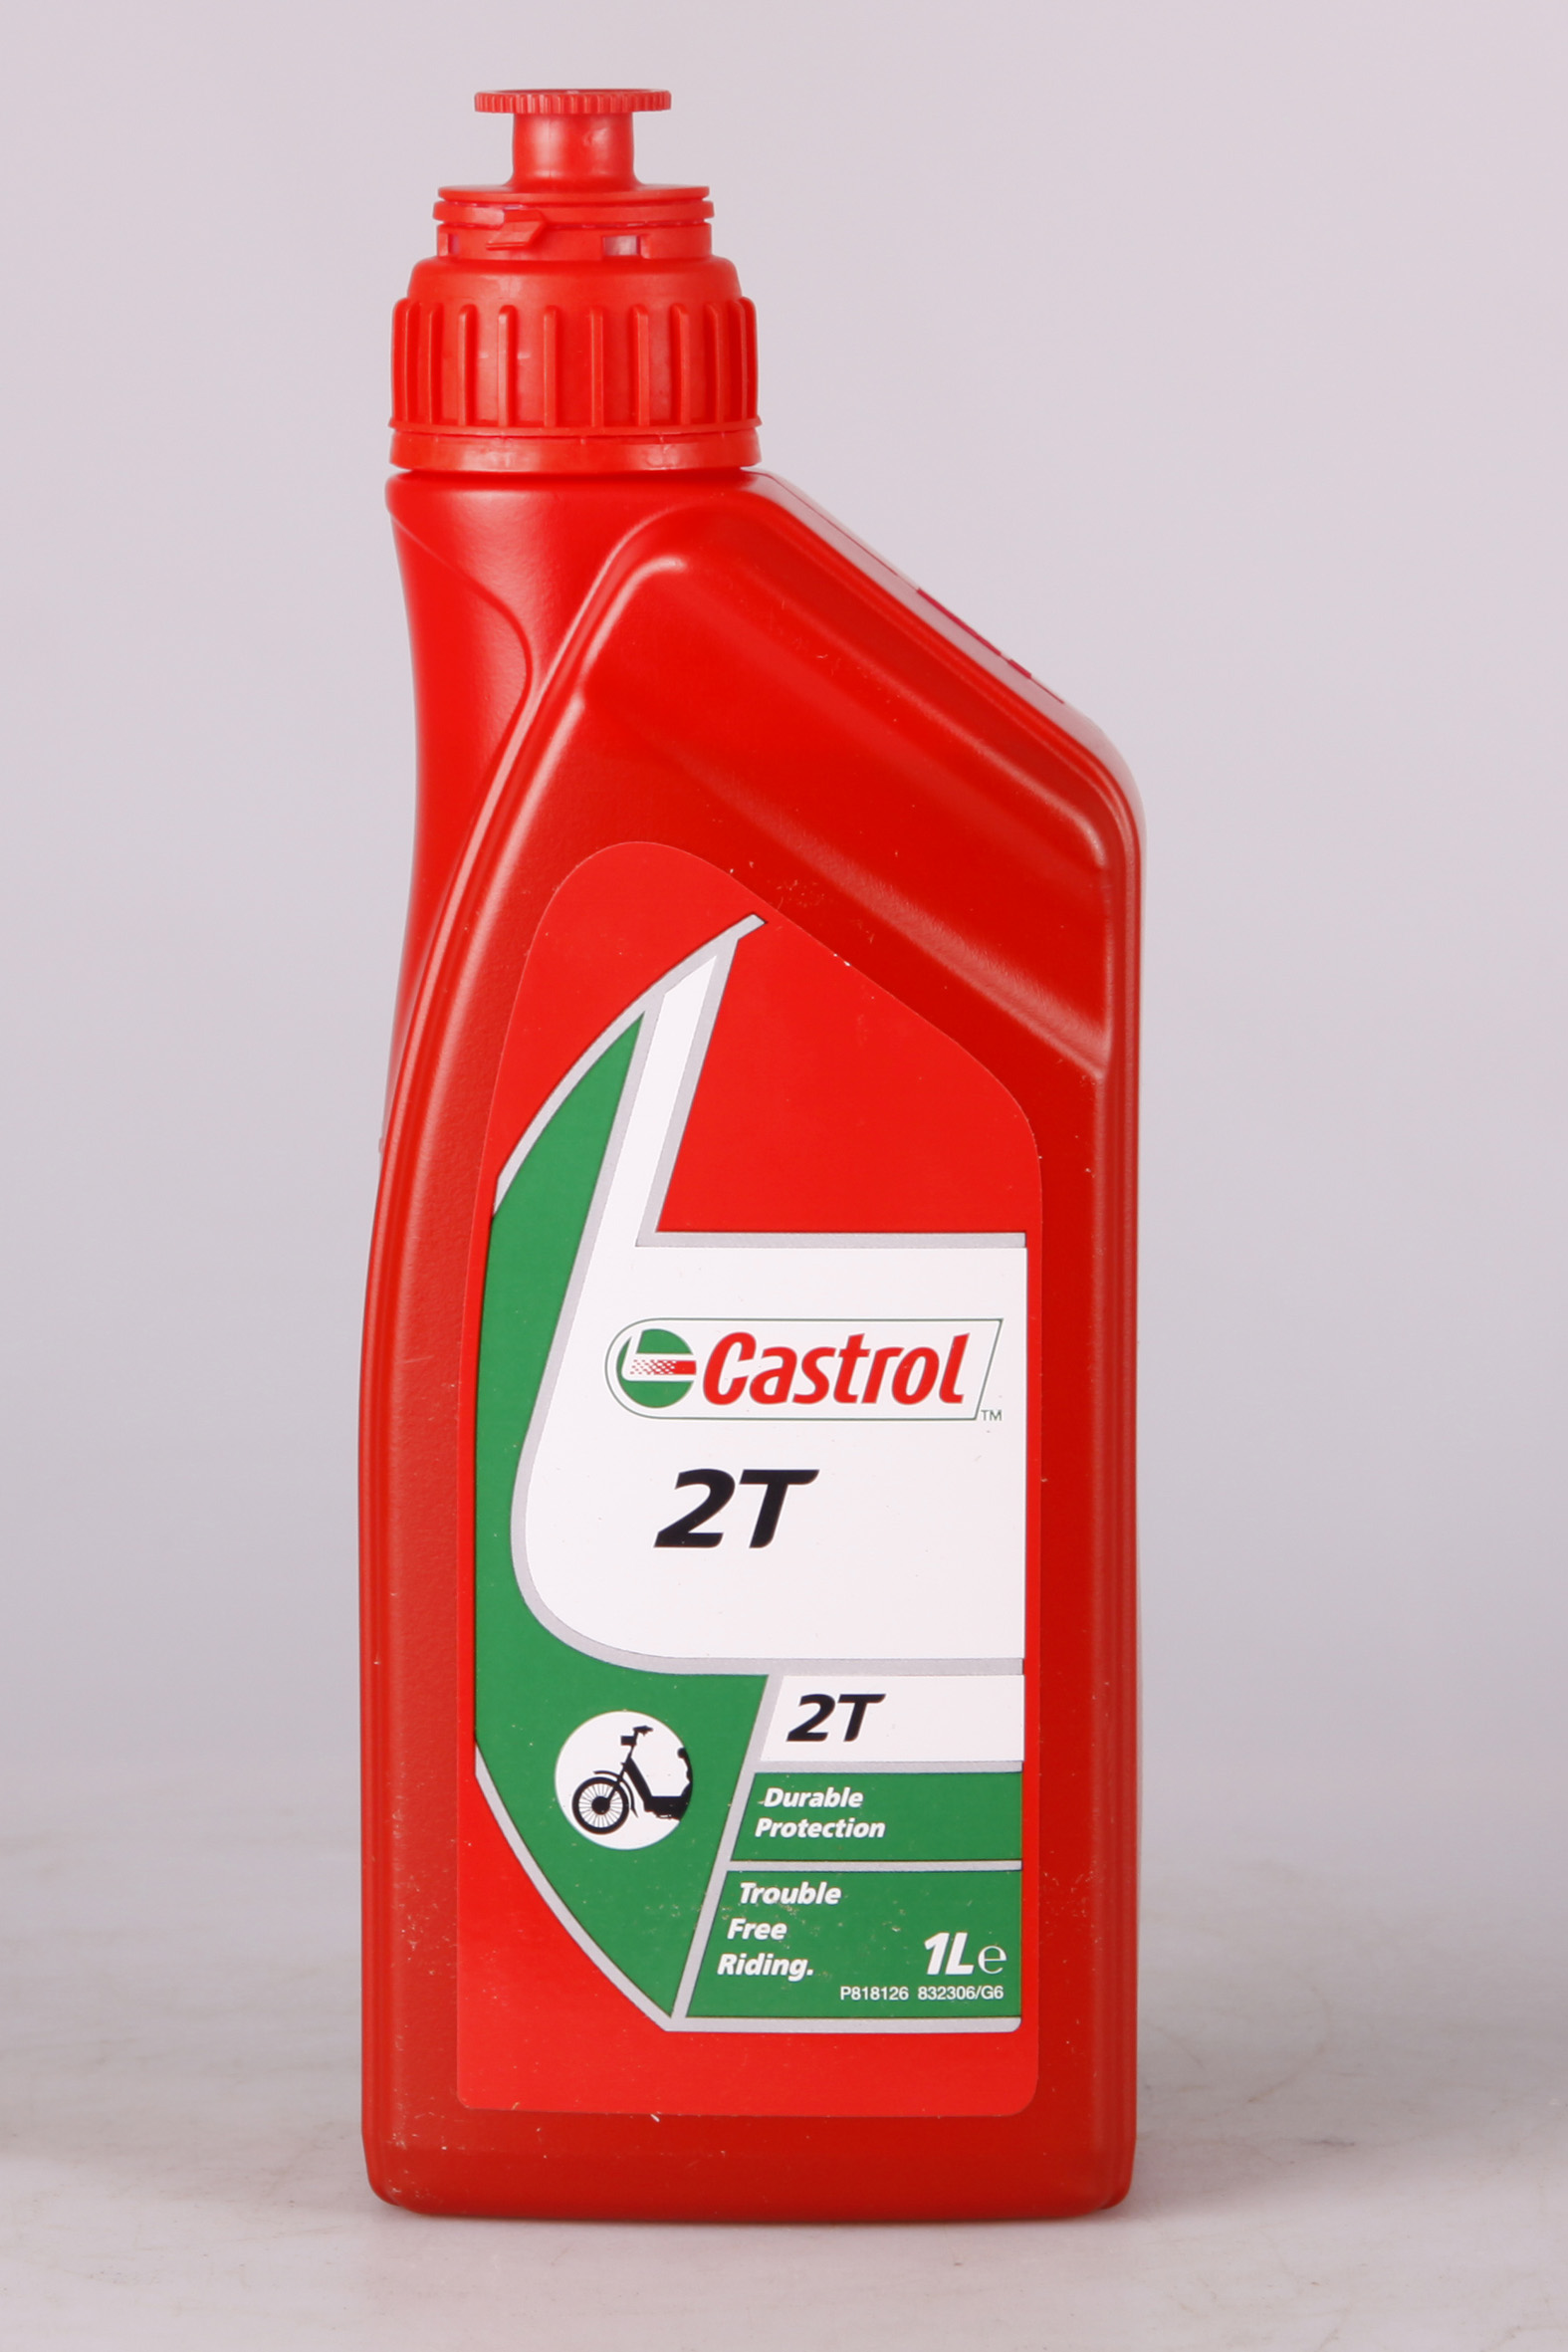 Castrol 2T 1 Liter